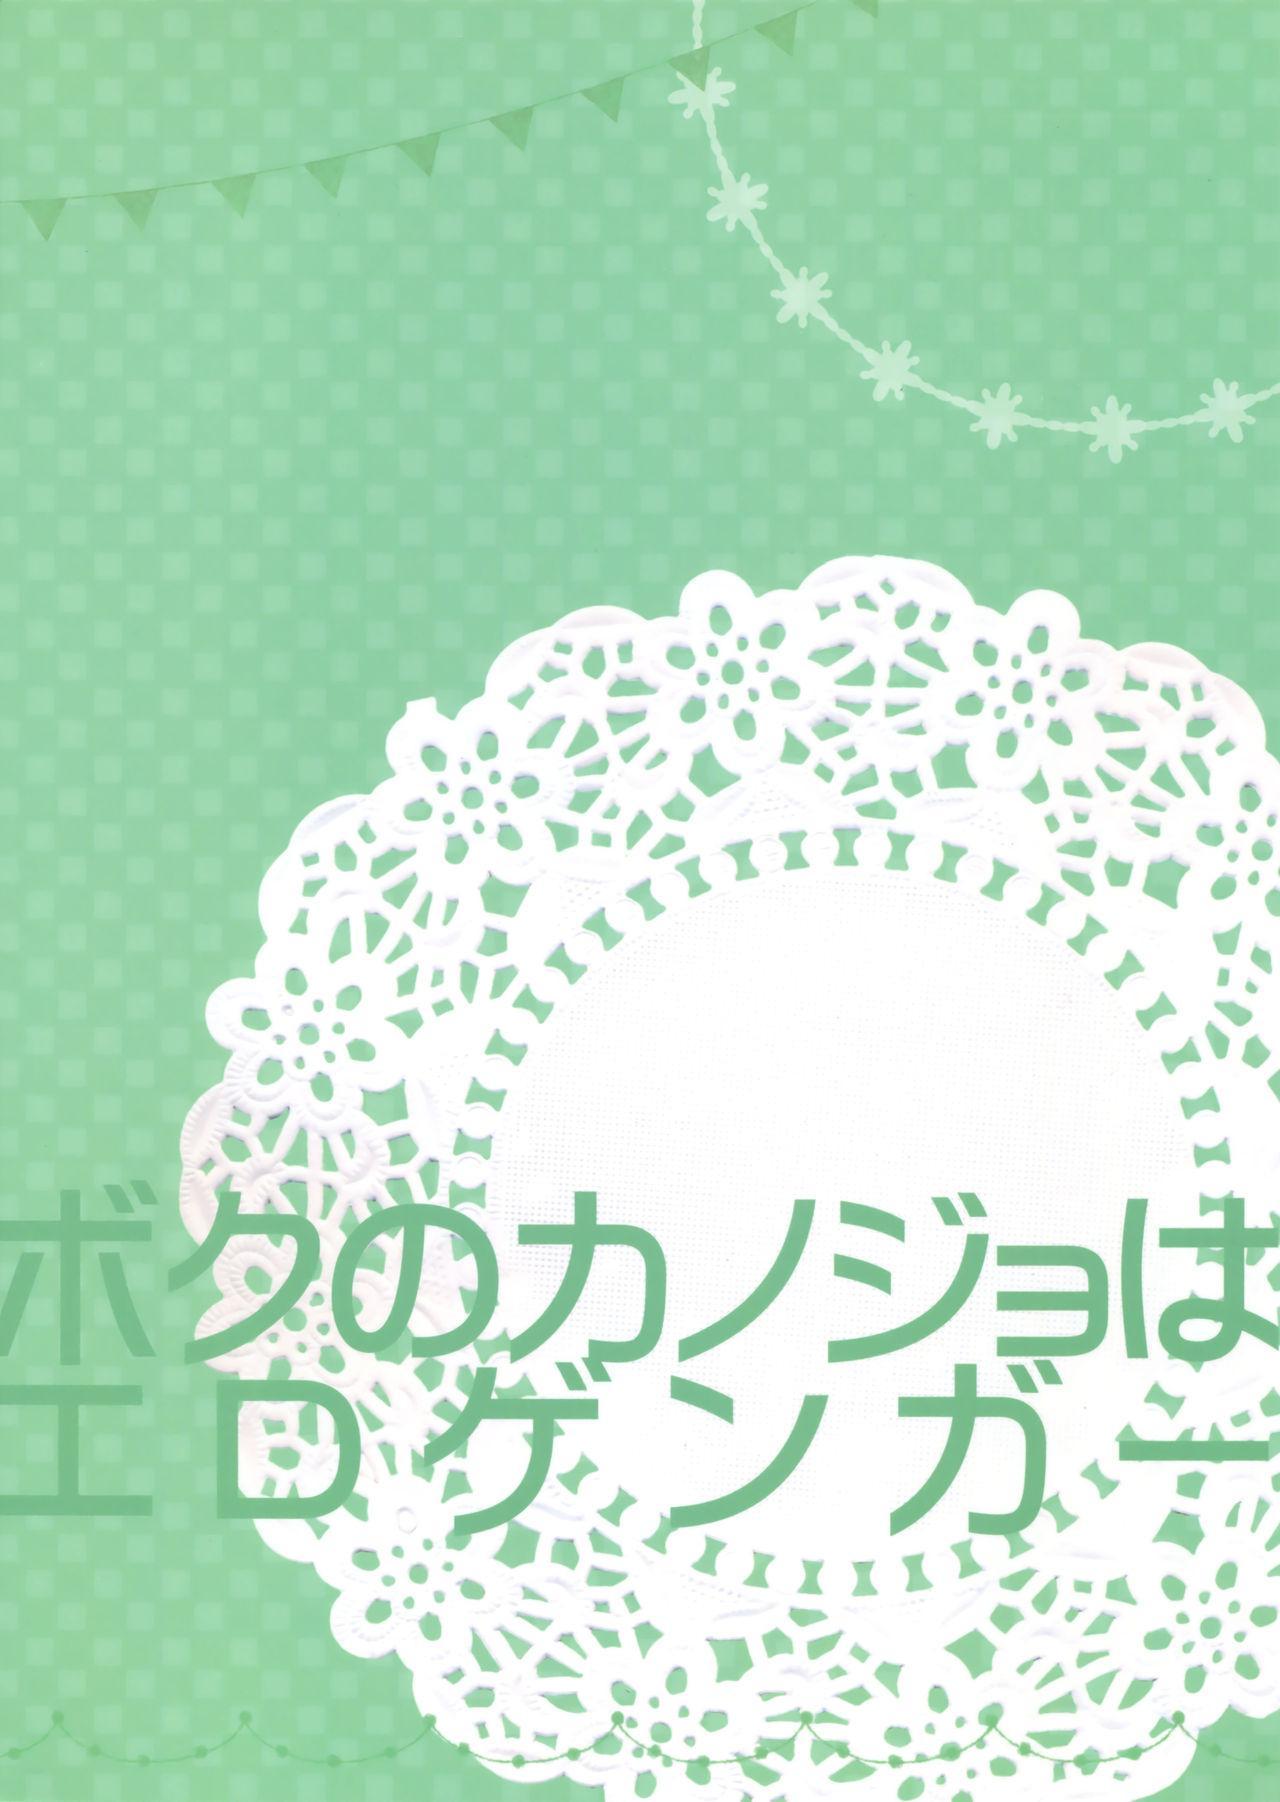 Boku no Kanojo wa Erogenger 2 | My Girlfriend Is Erogenger 2 21